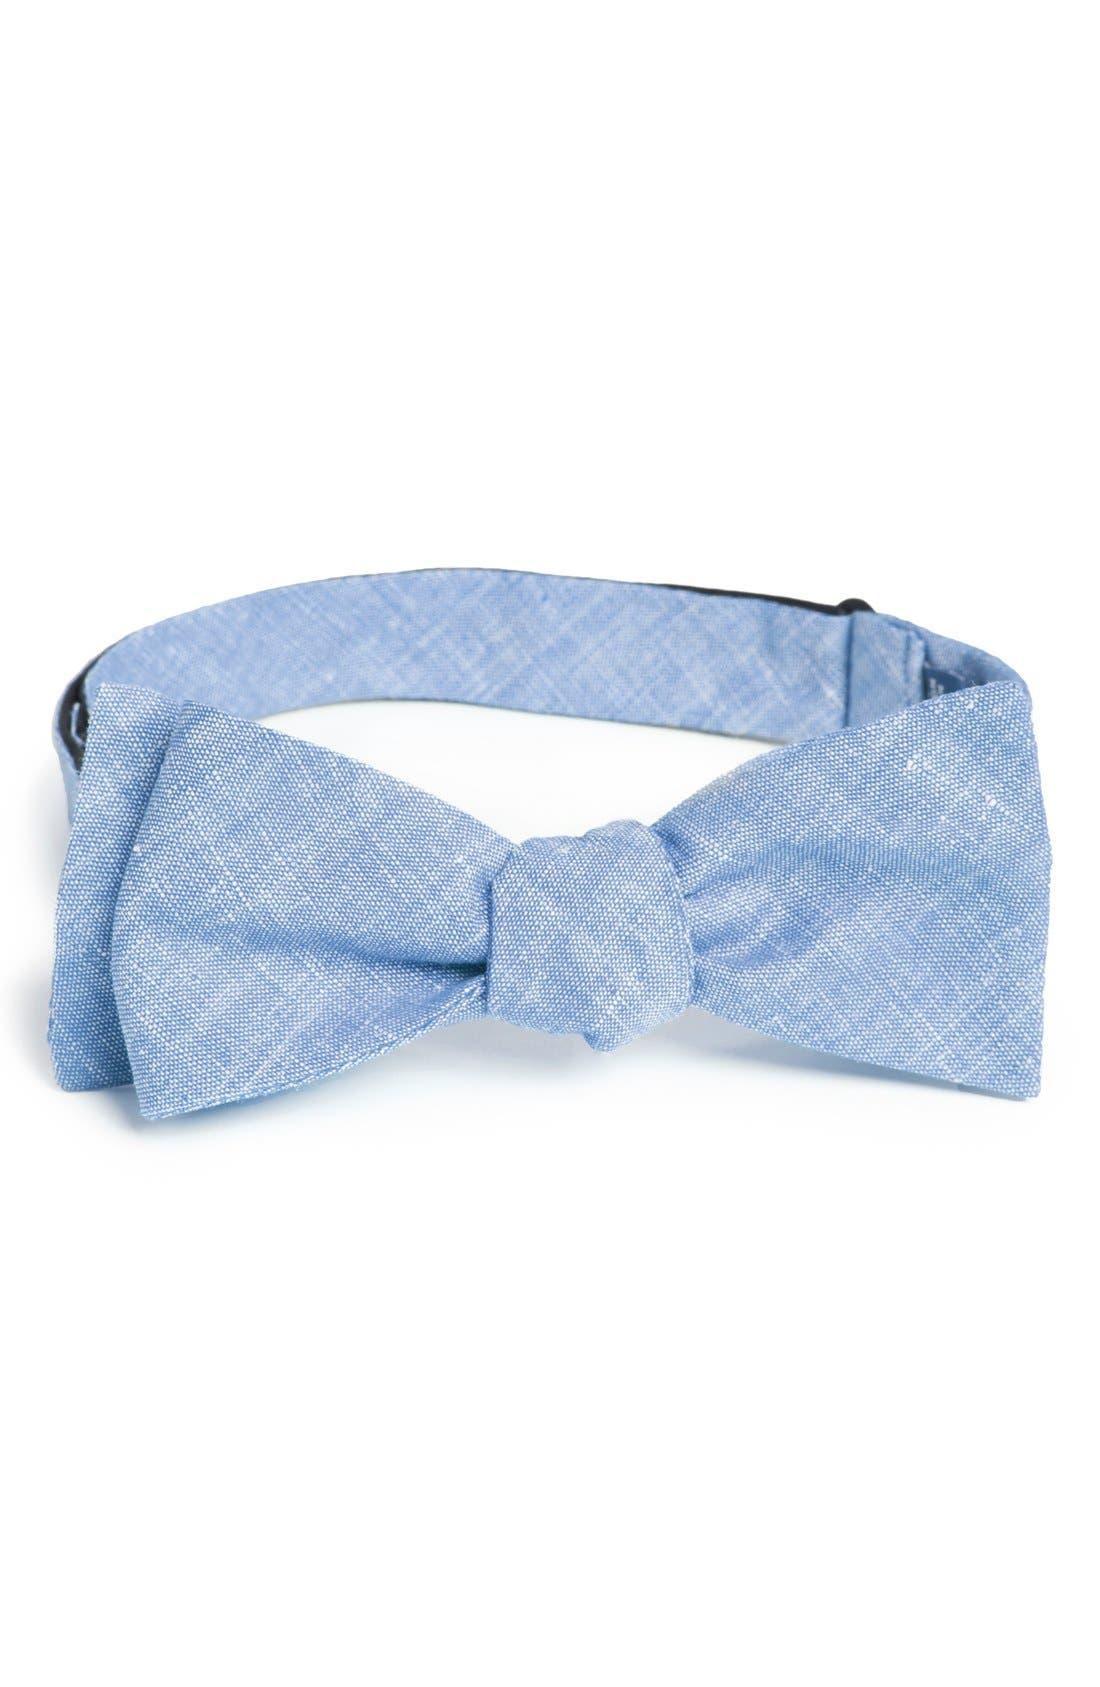 Main Image - Original Penguin Cotton Bow Tie